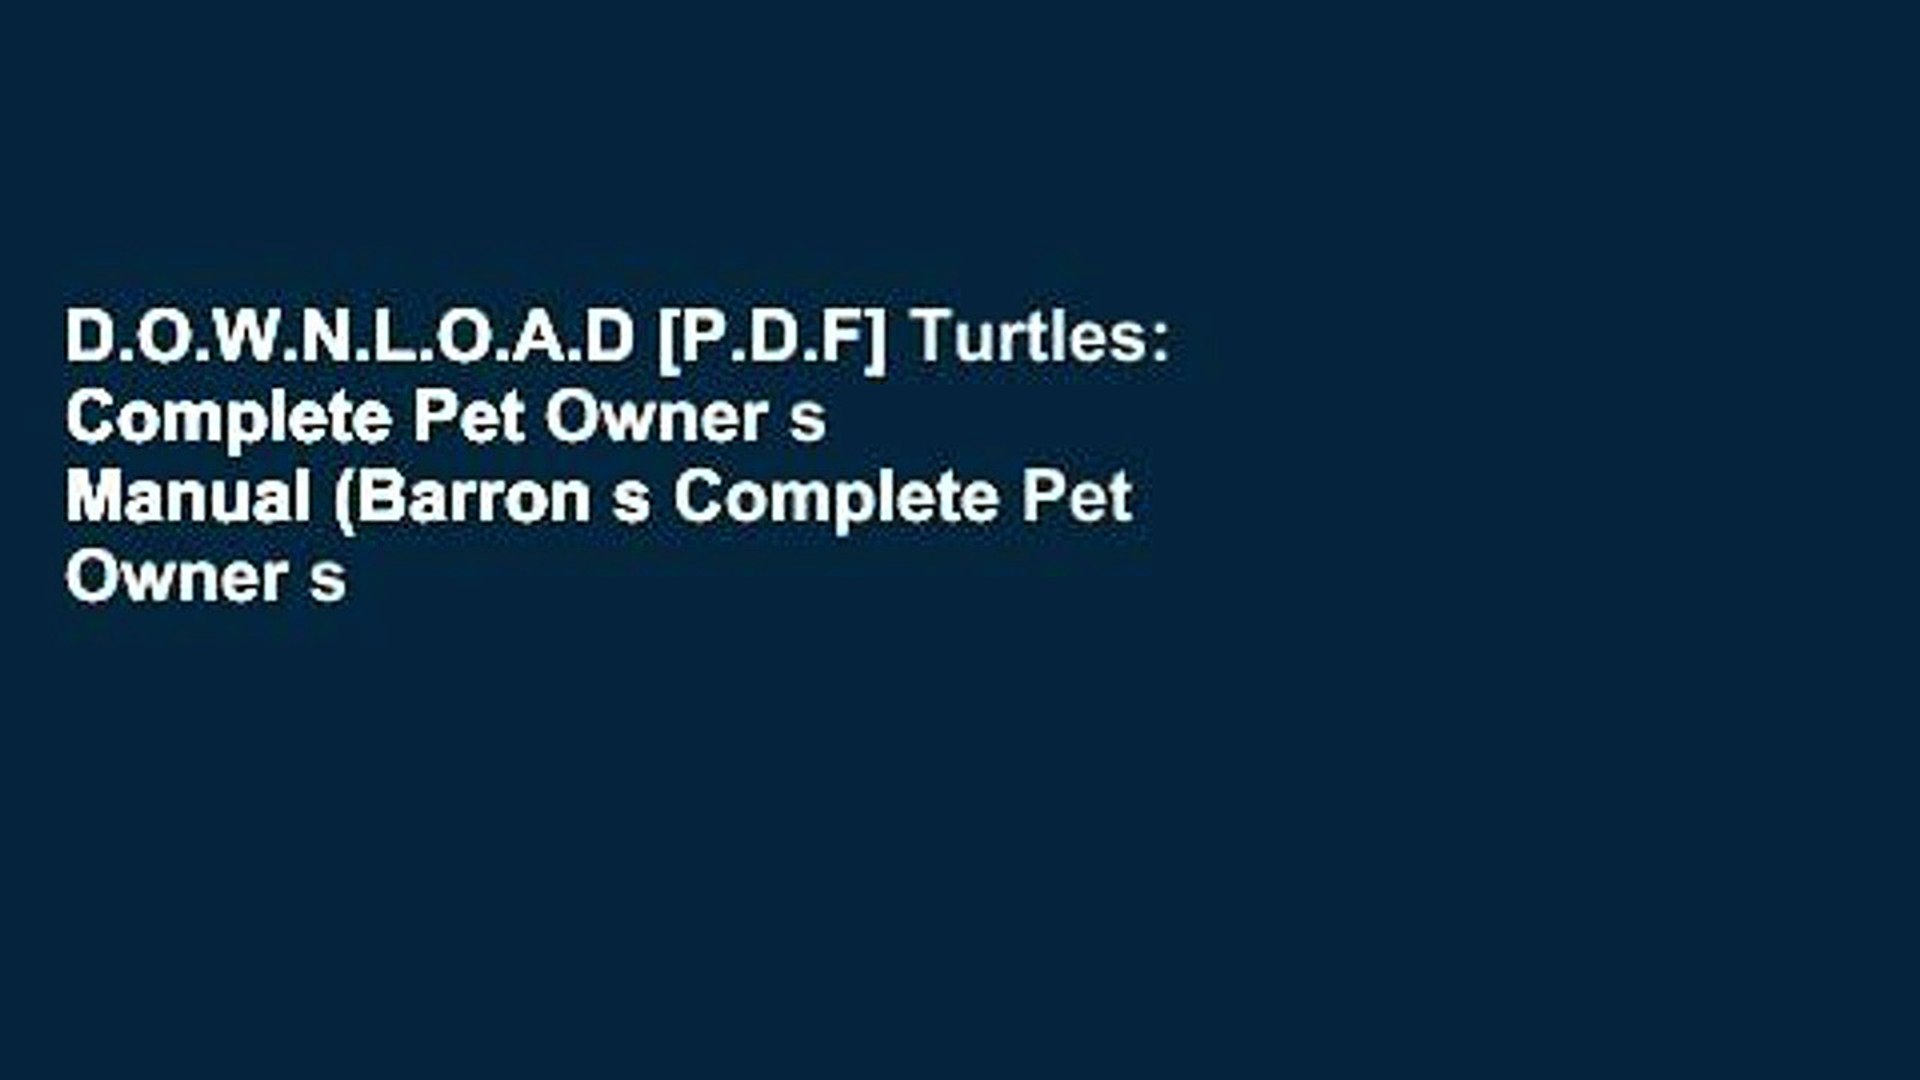 D.O.W.N.L.O.A.D [P.D.F] Turtles: Complete Pet Owner s Manual (Barron s Complete Pet Owner s